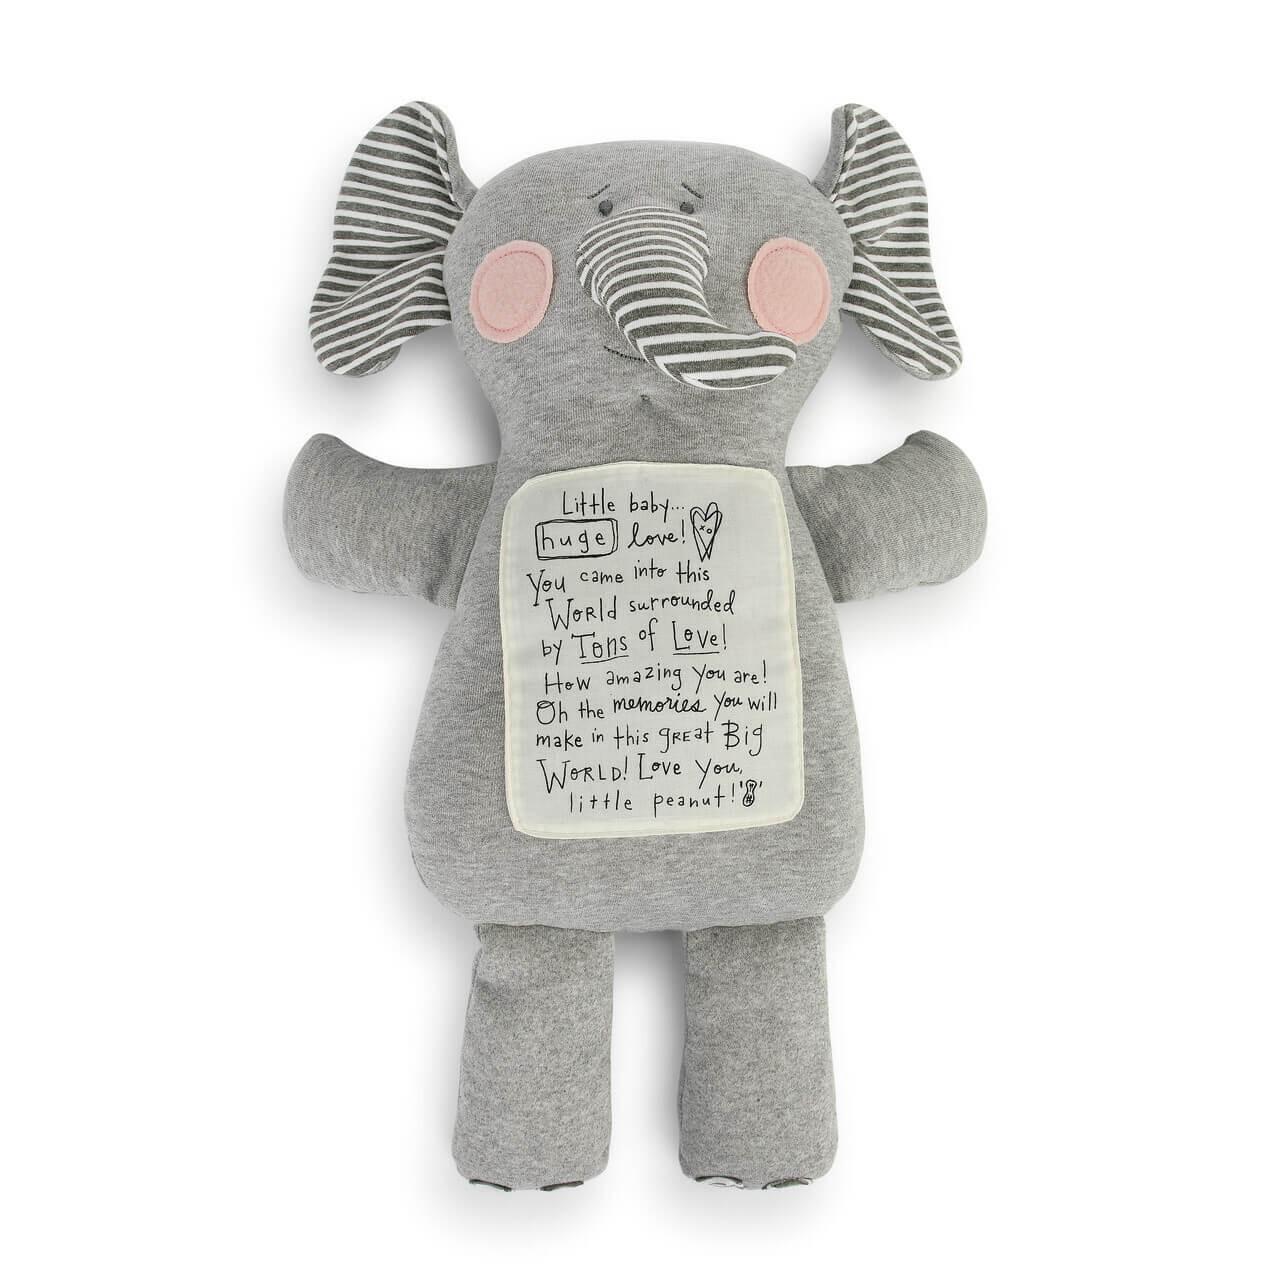 Demdaco Noah's Ark Tons of Love Elephant